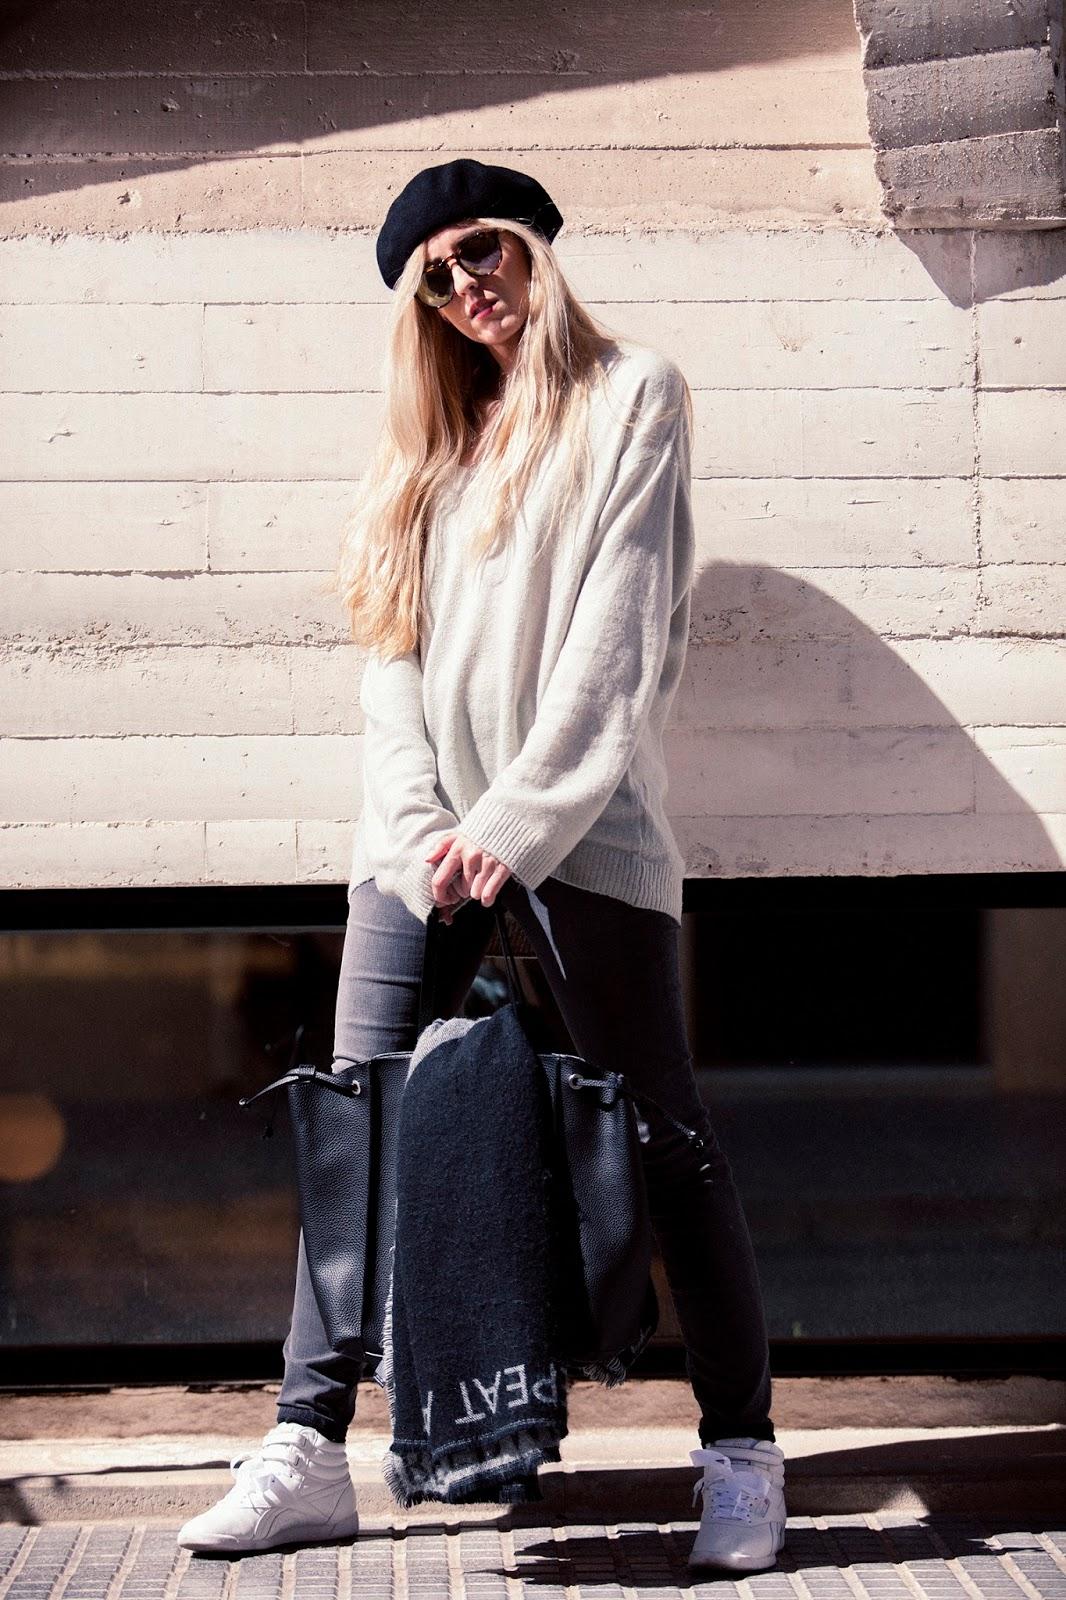 b34f57485 Jersey oversize   Bloguera de moda Málaga - Bloguera de moda Málaga ...